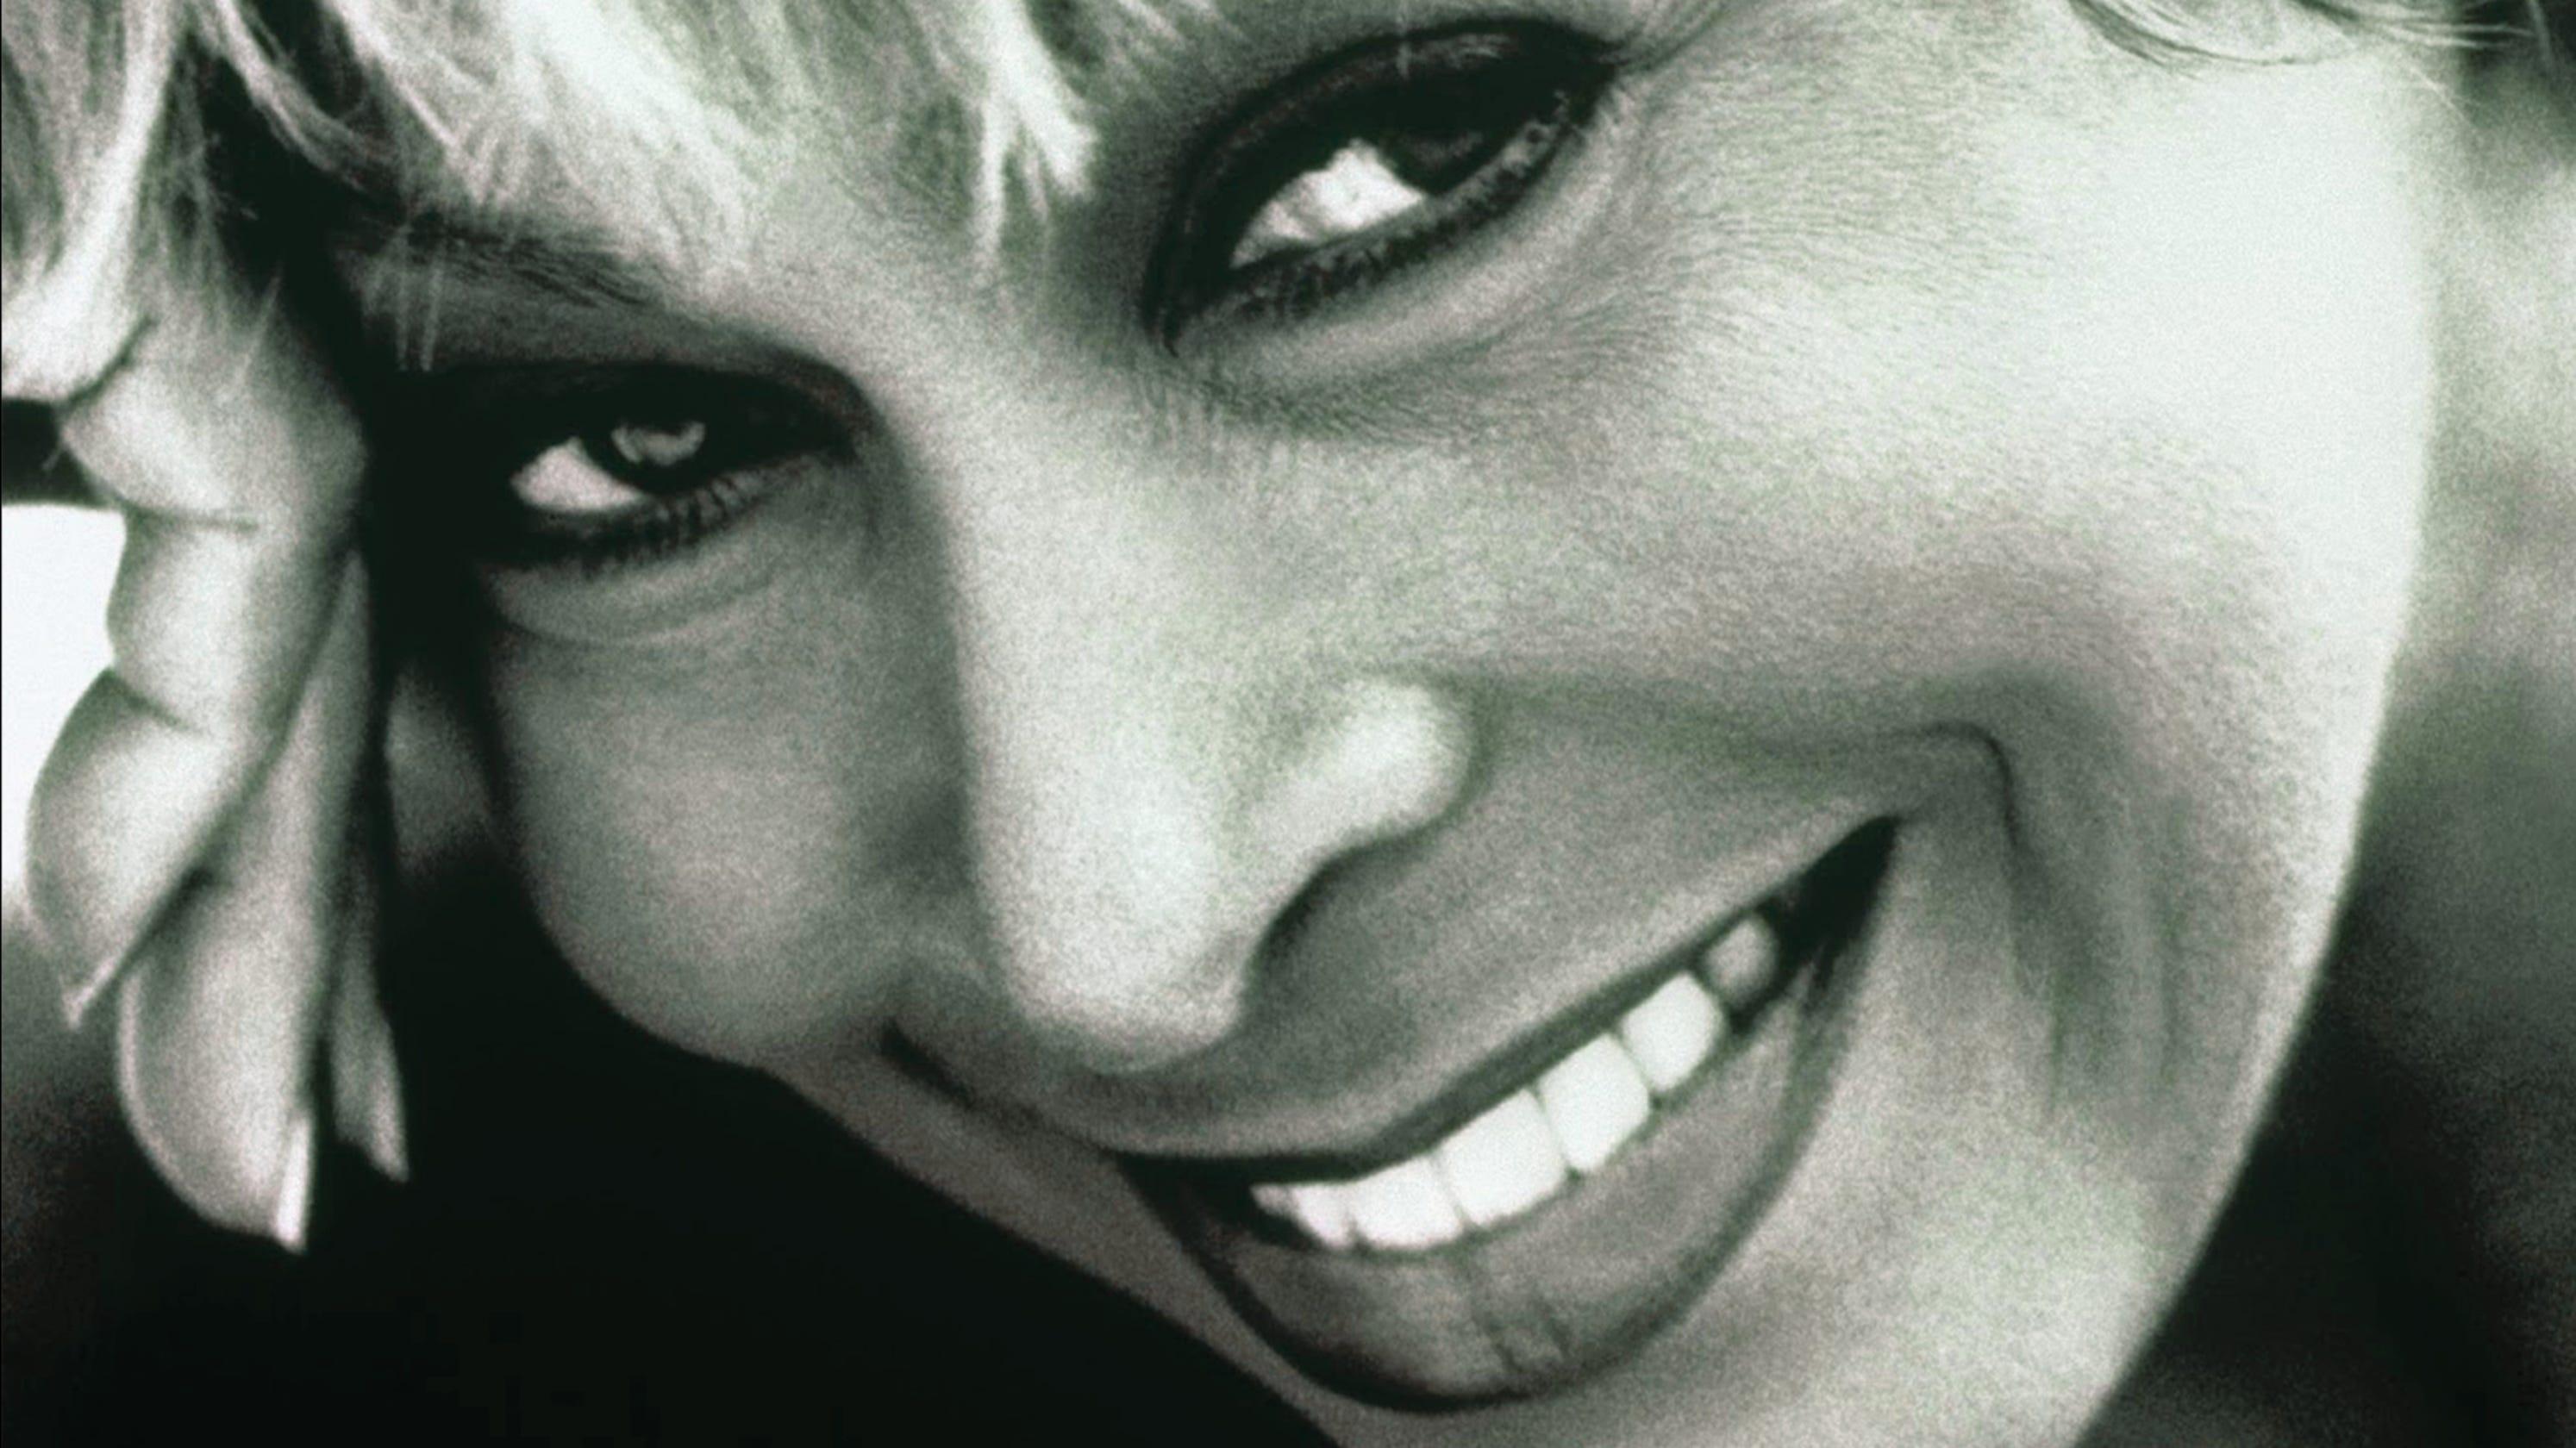 Tina Turner's most shocking revelations from memoir 'My Love